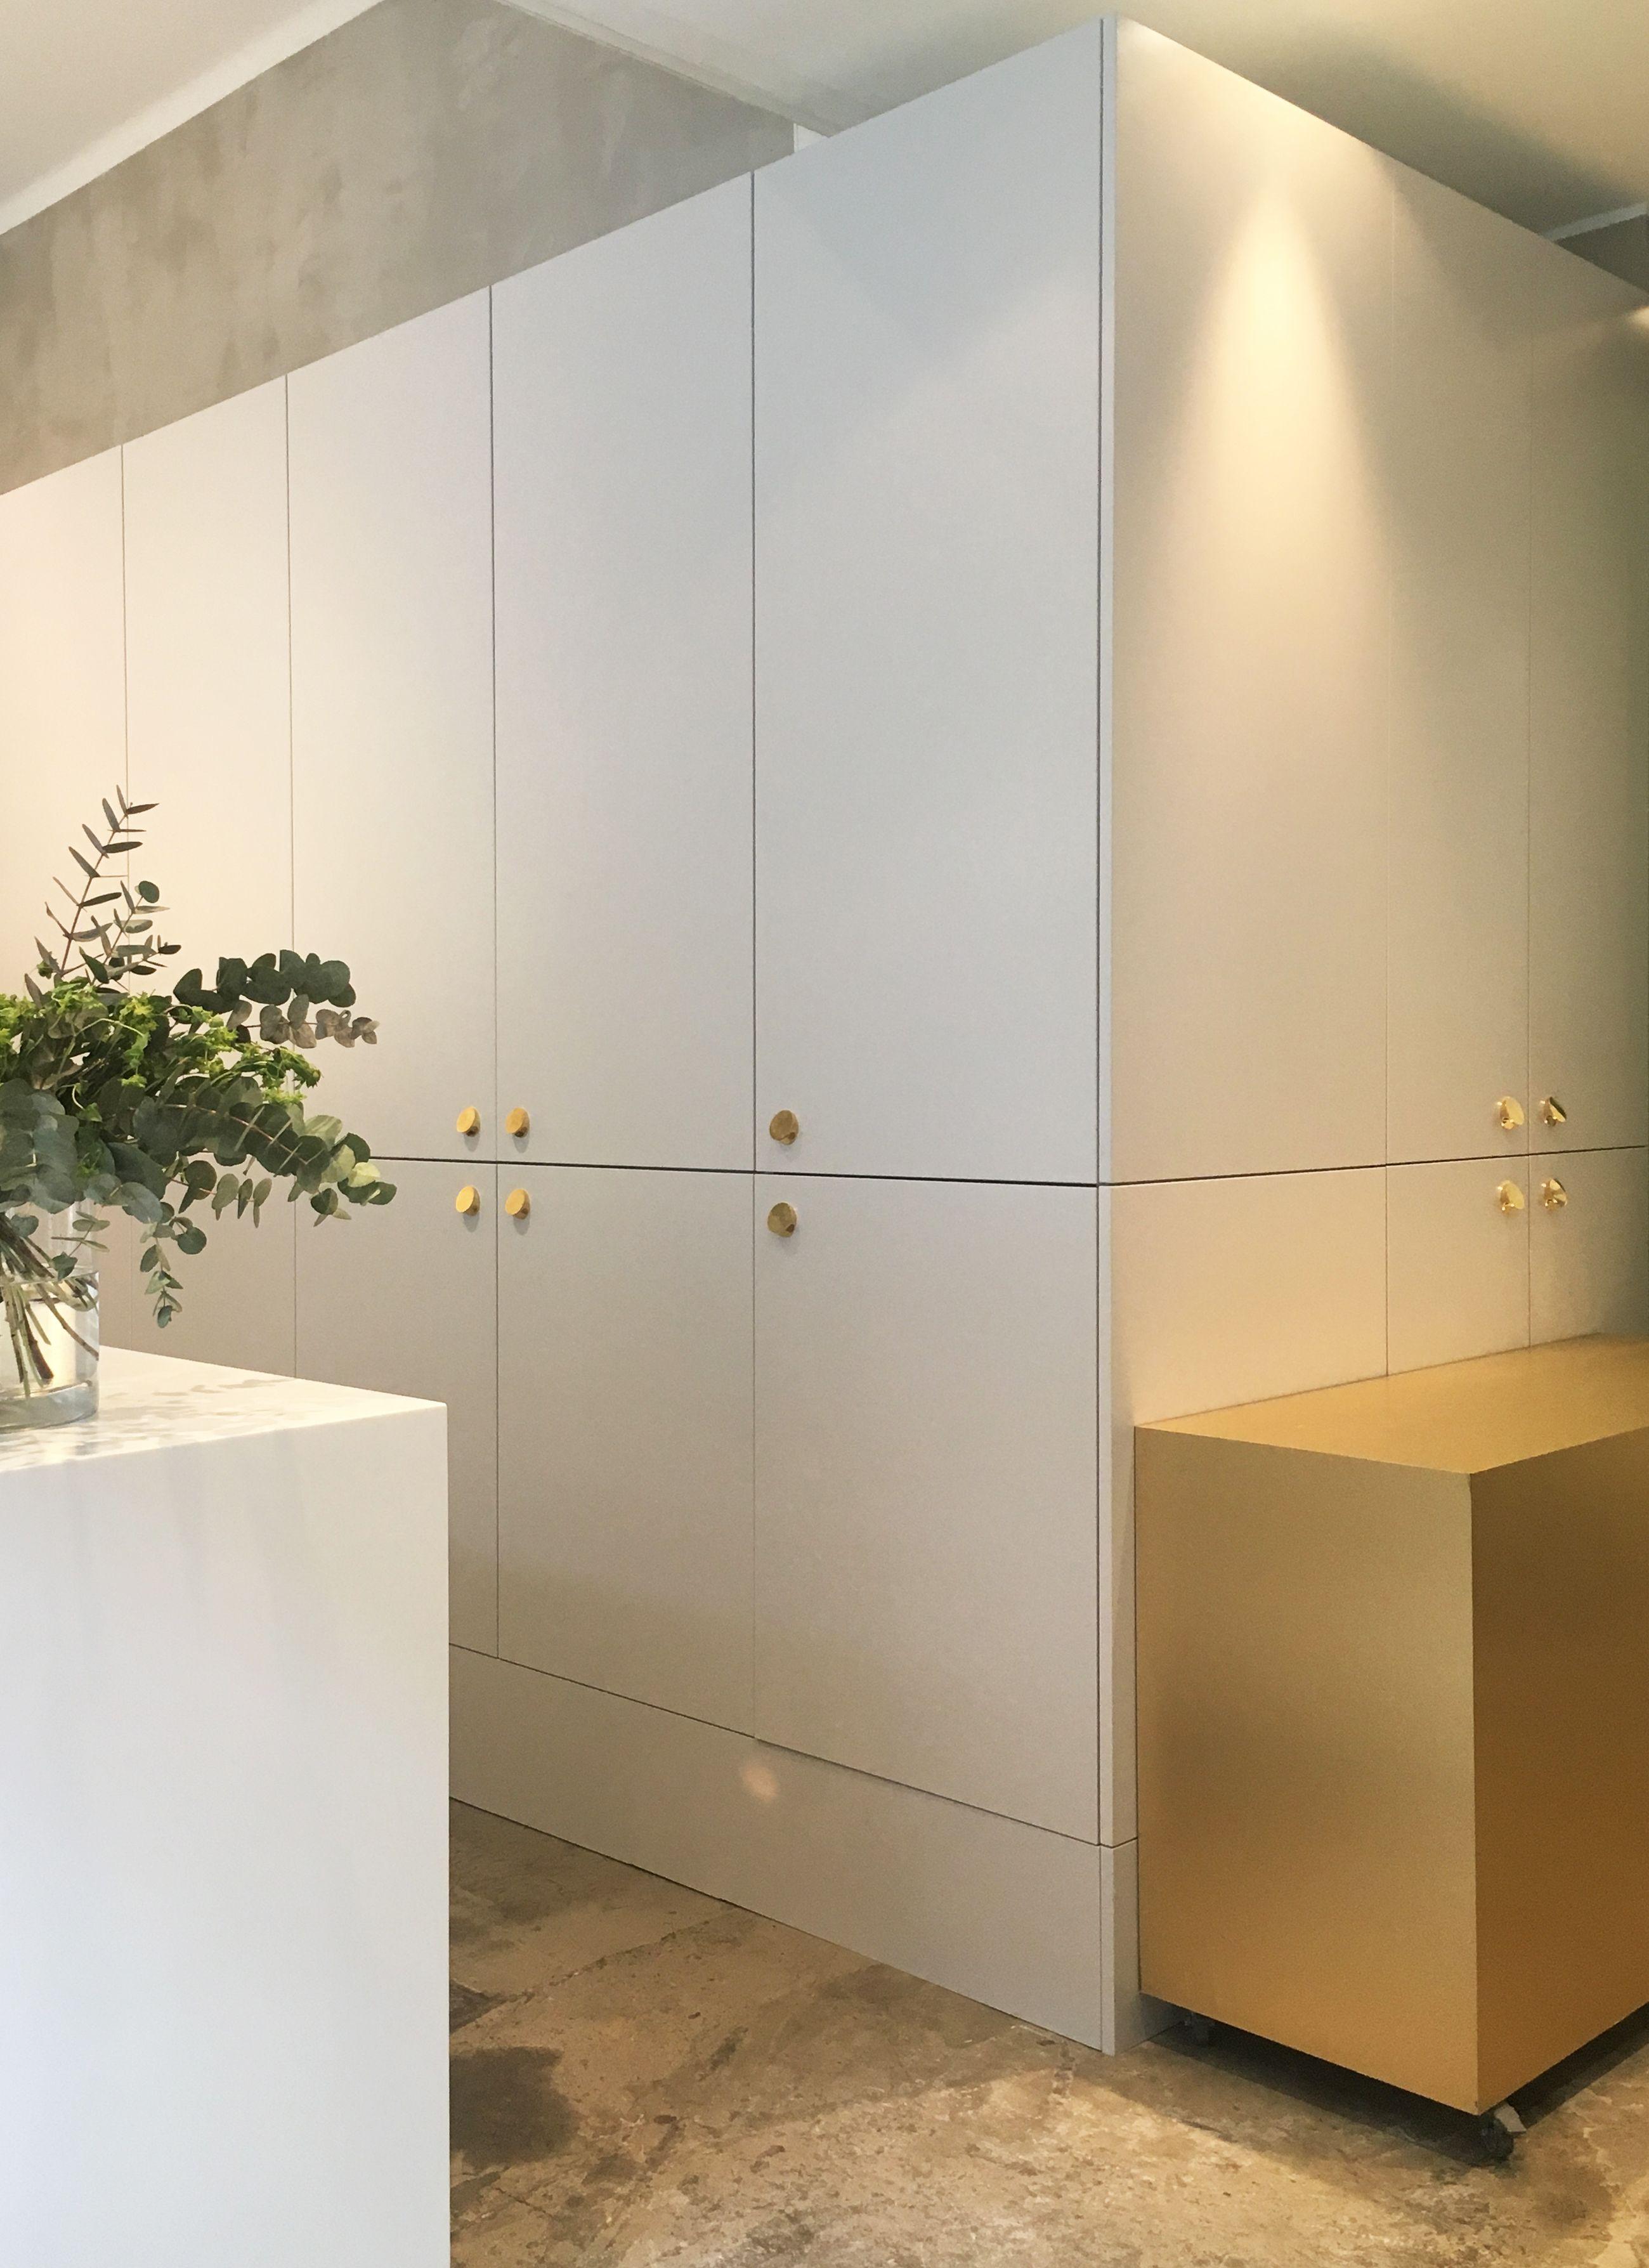 PR Agency Milttonu0027s Showroom. A.S.Helsingö Kitchen Built On IKEA Cabinet  Frames.